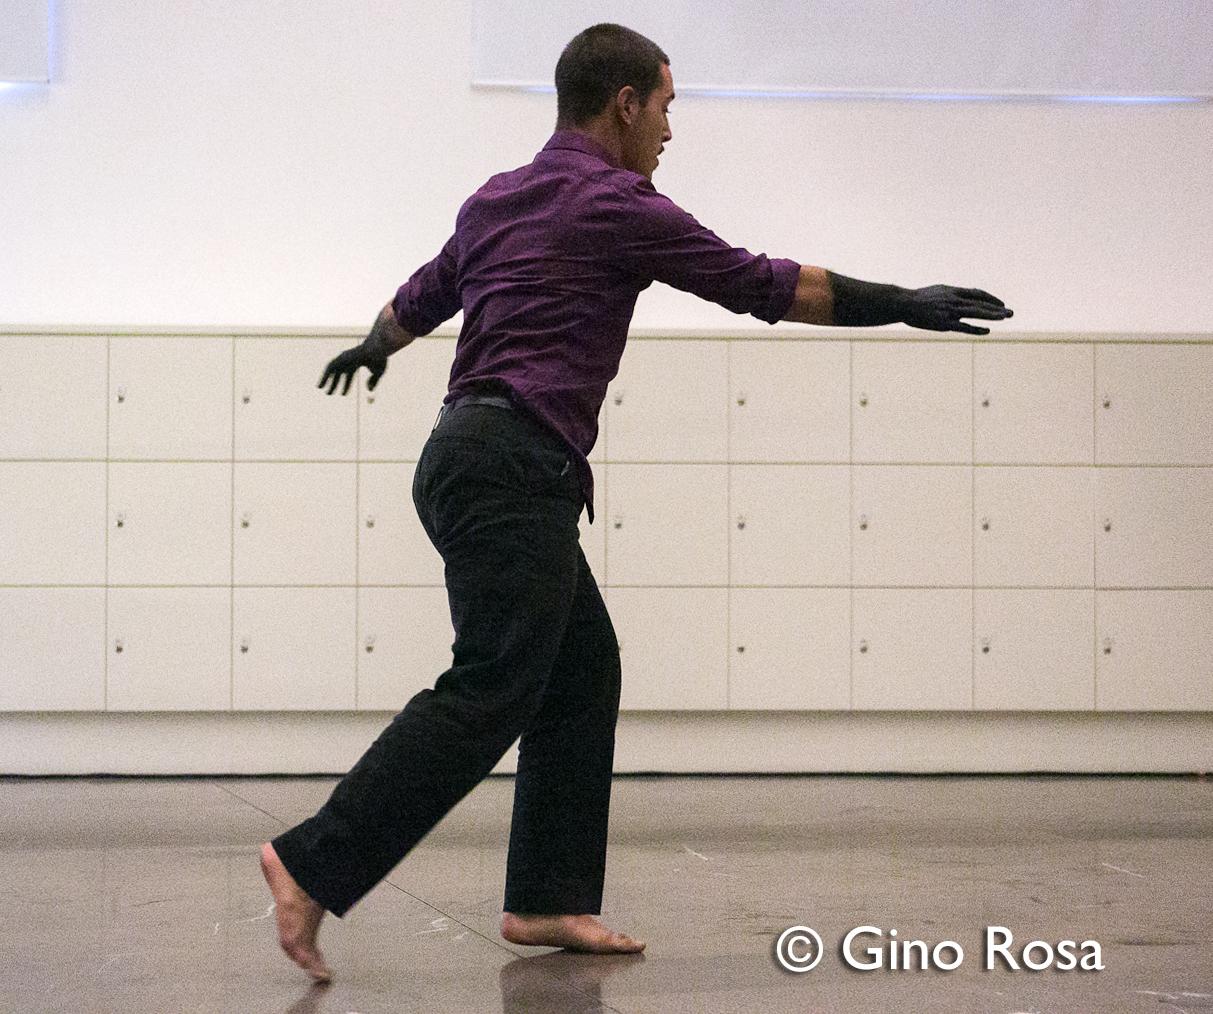 https://www.danzaurbana.eu/associazione/wp-content/uploads/2018/05/Masdanza_A_Frutos_2012.jpg